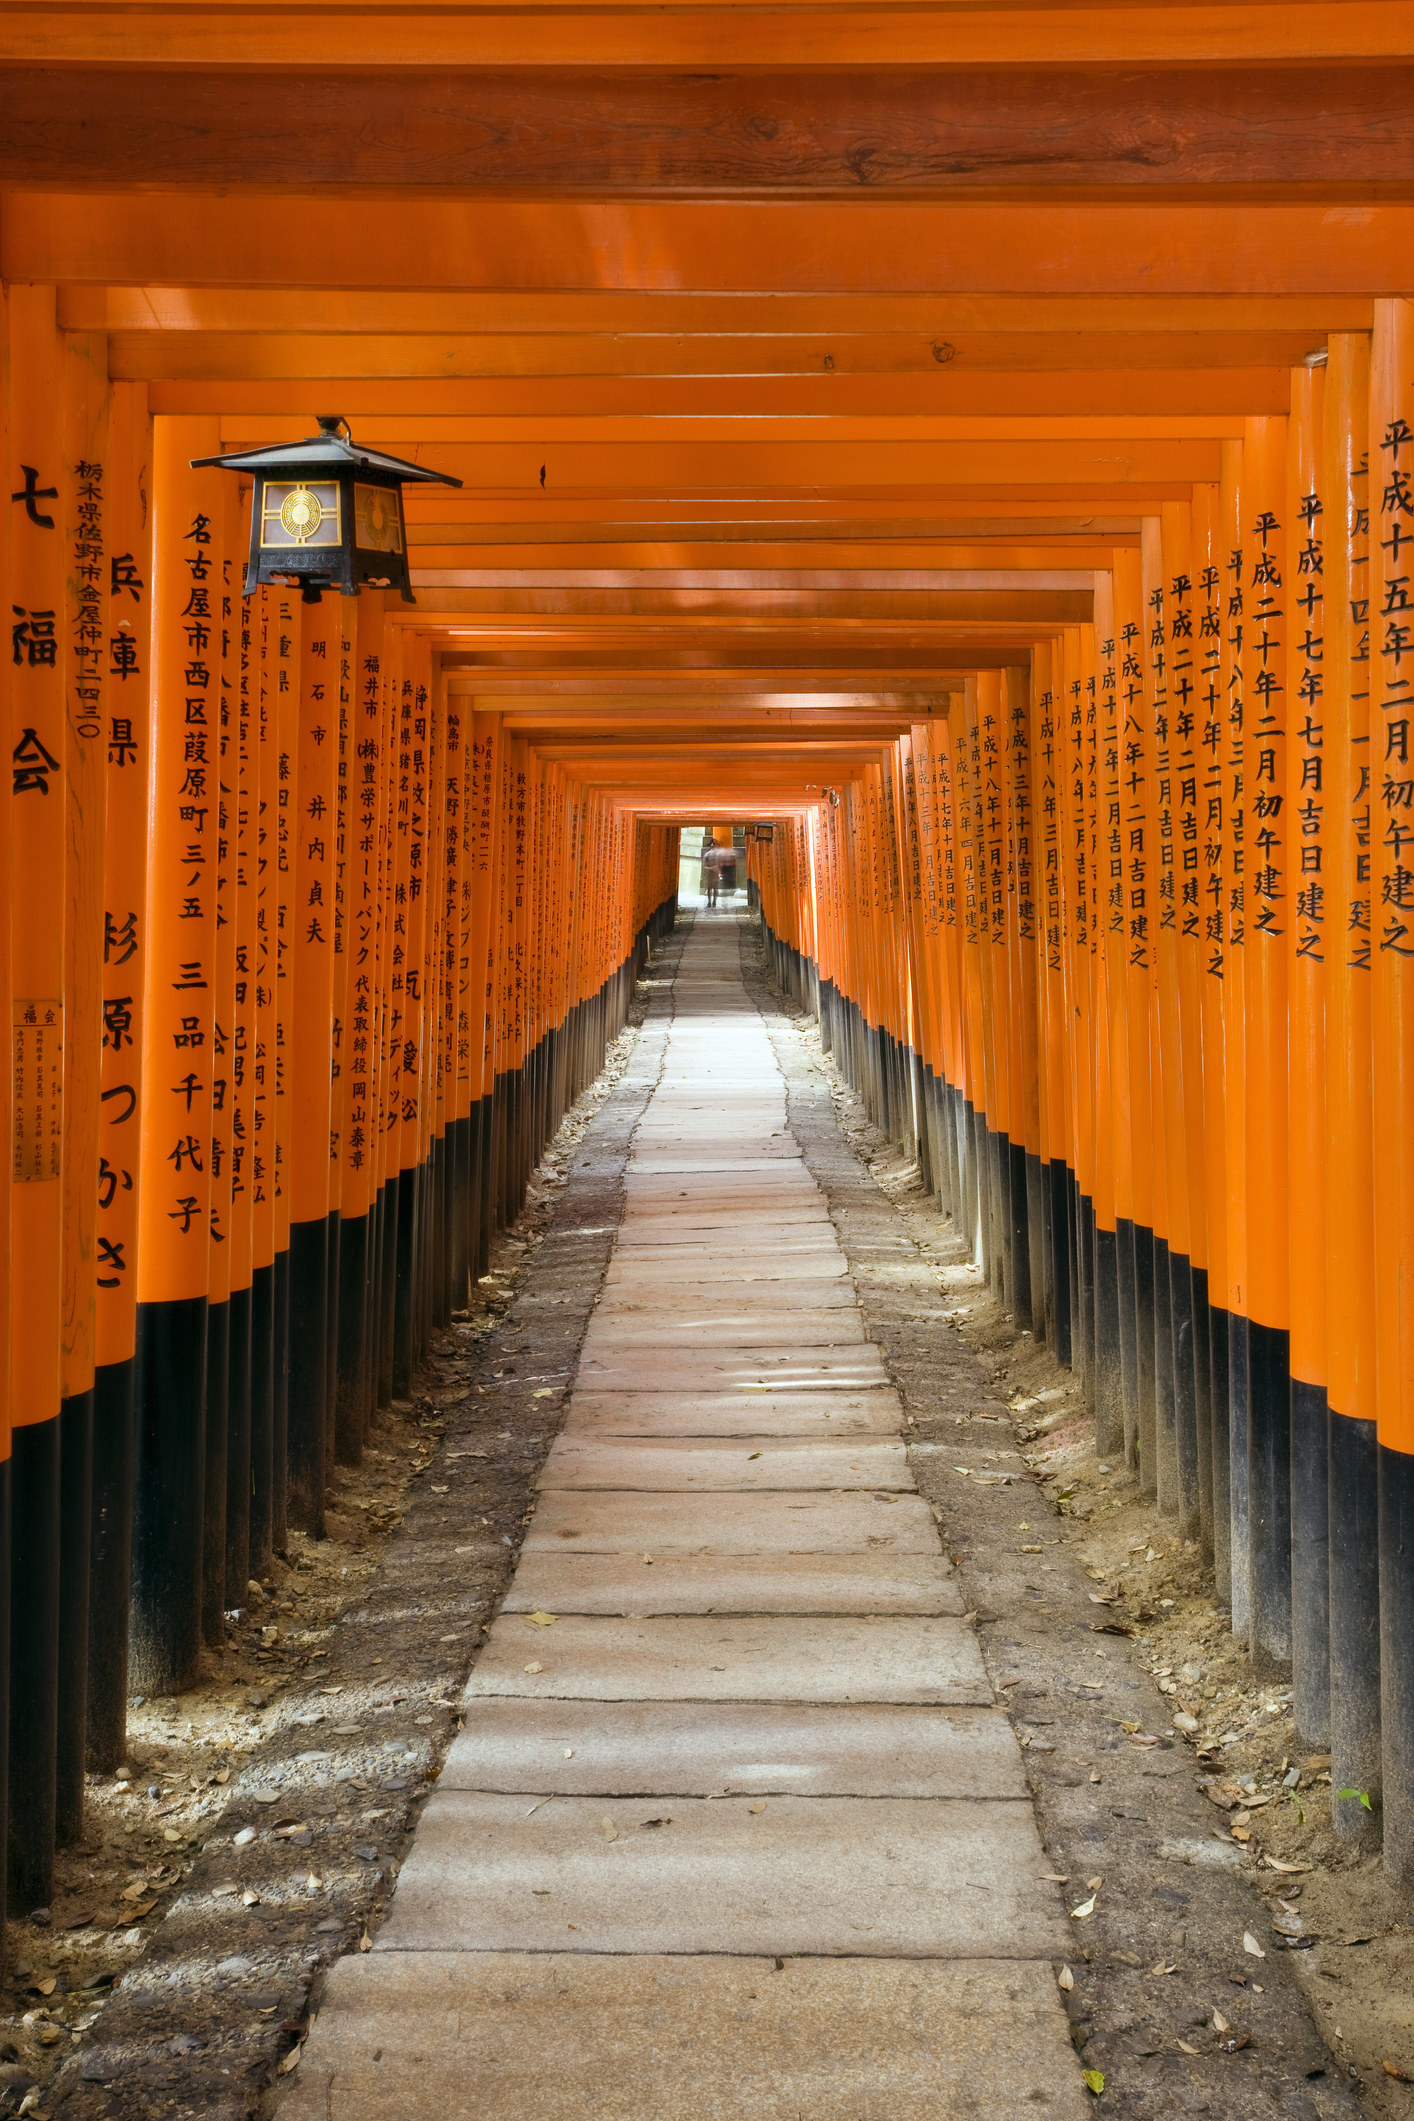 Torii gates at Fushimi Inari Shrine, Kyoto